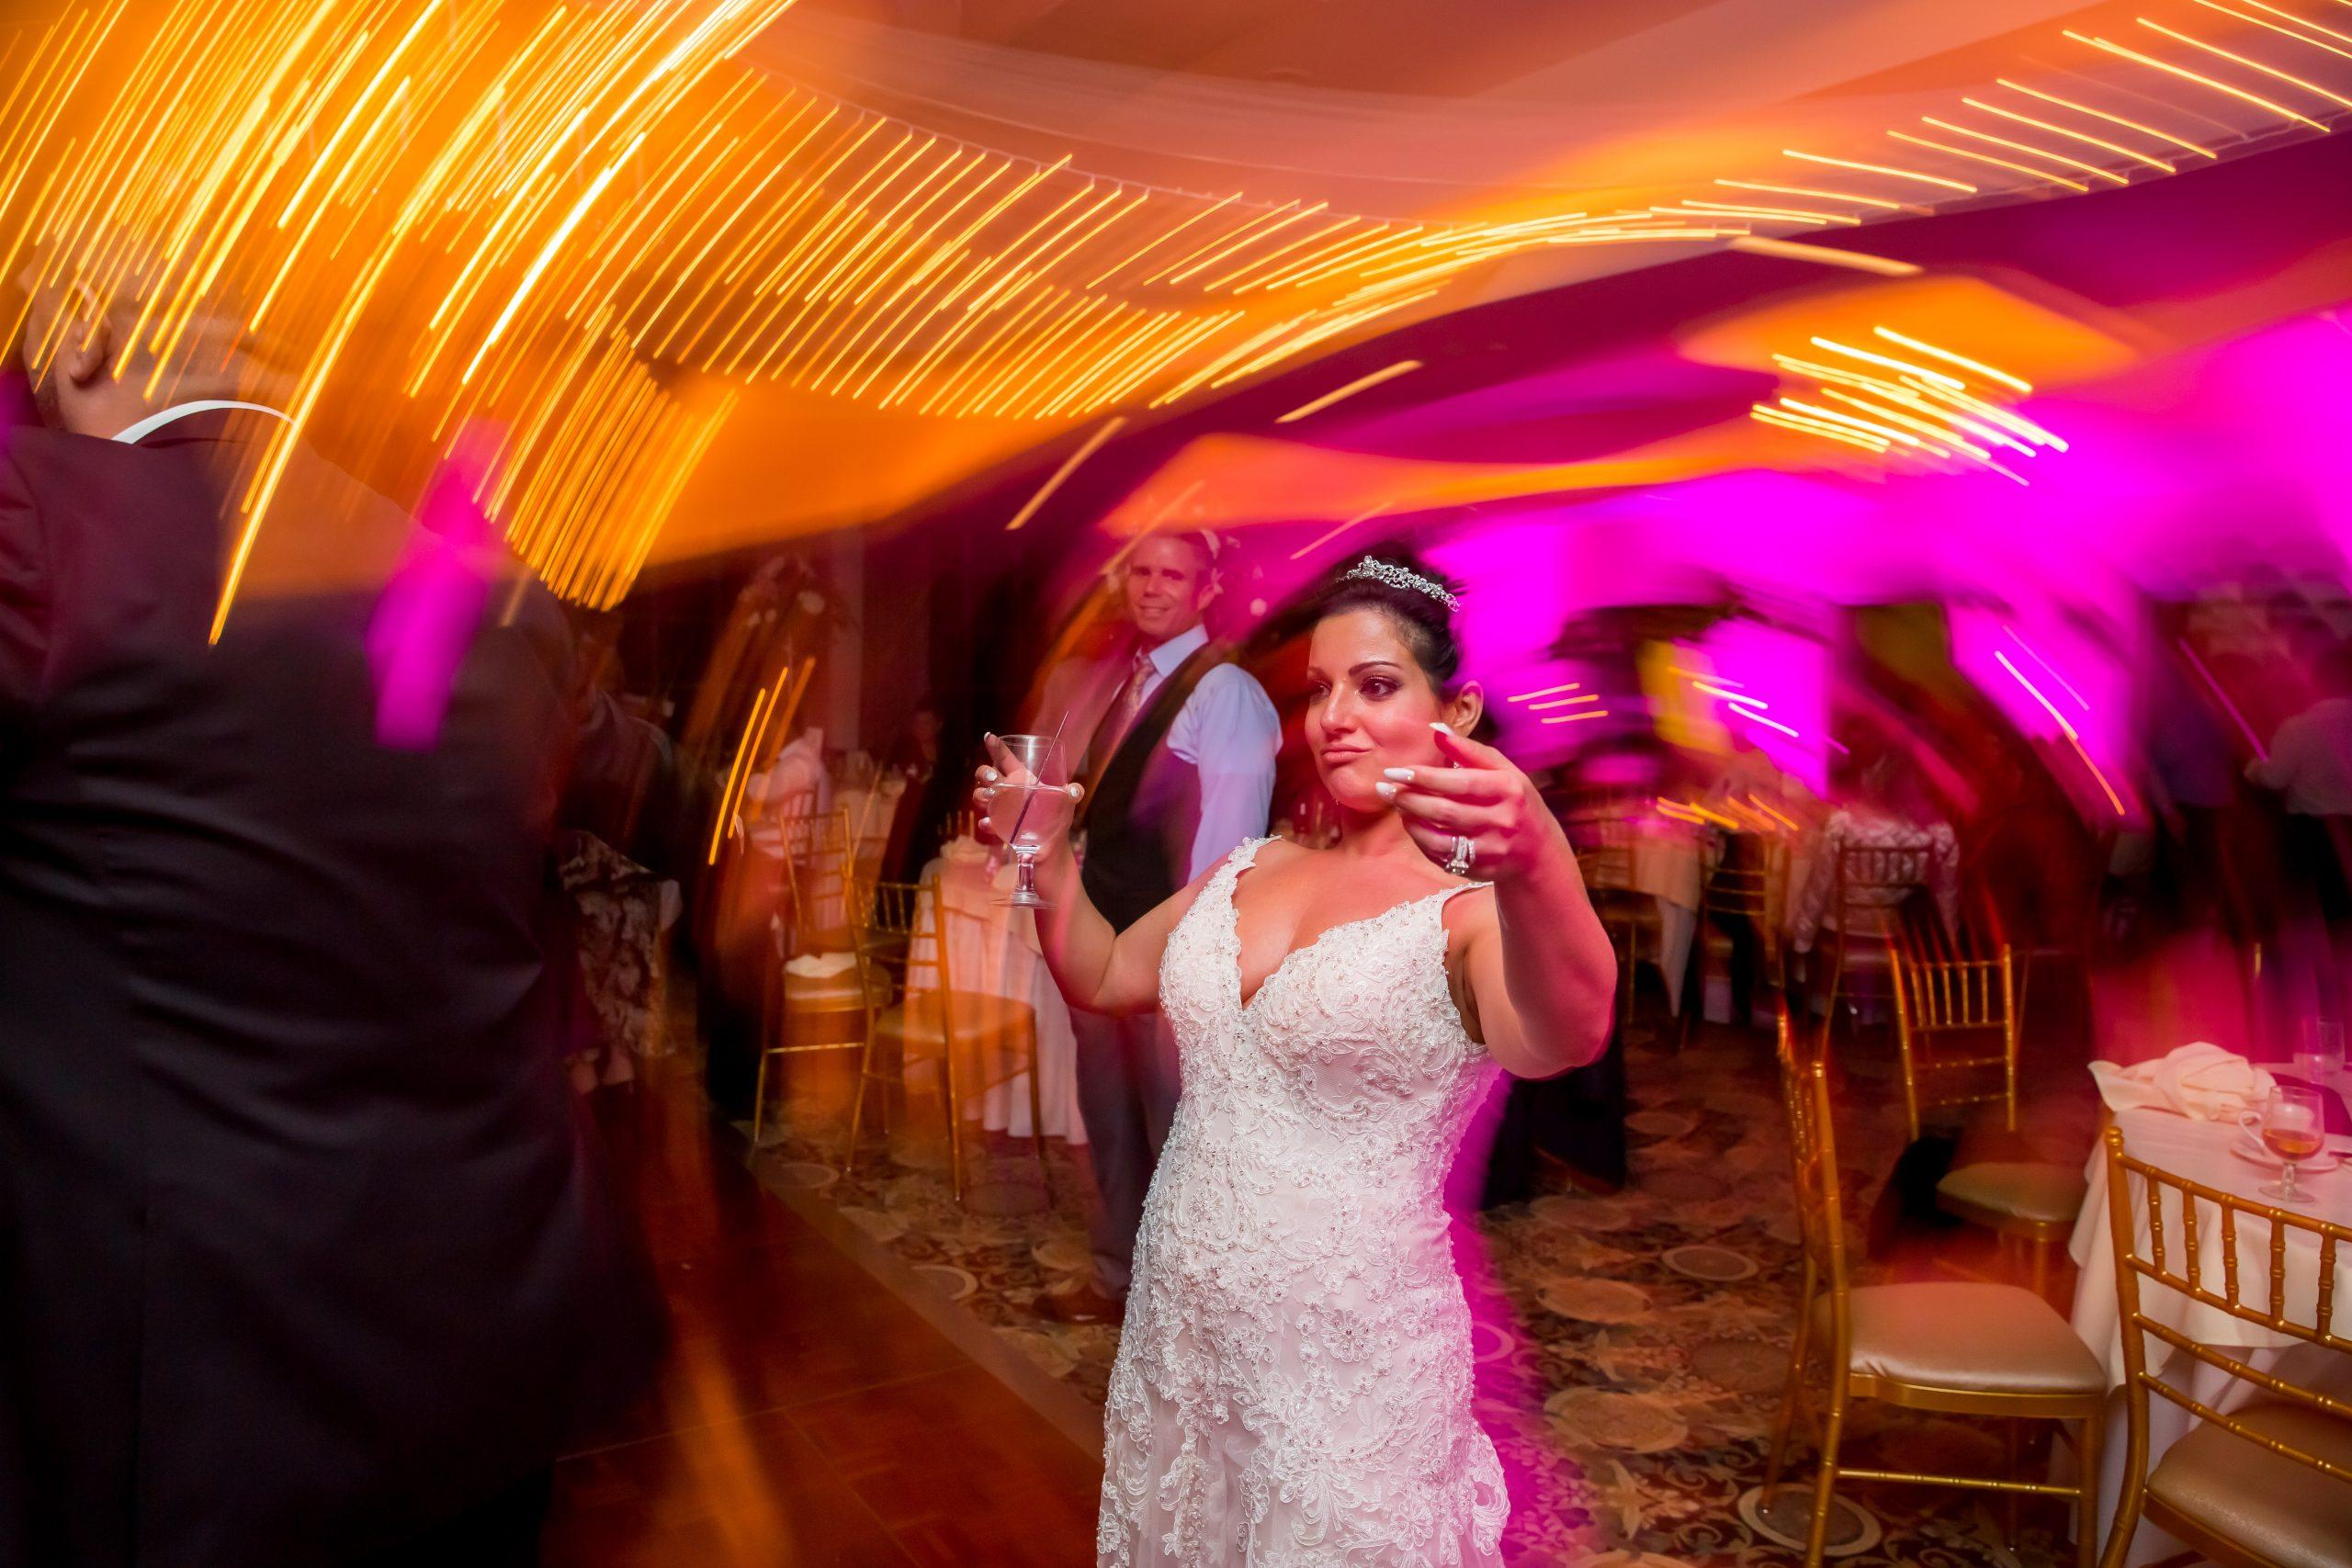 Victori_Rob_Mohawk River Country Club Wedding-62.jpg